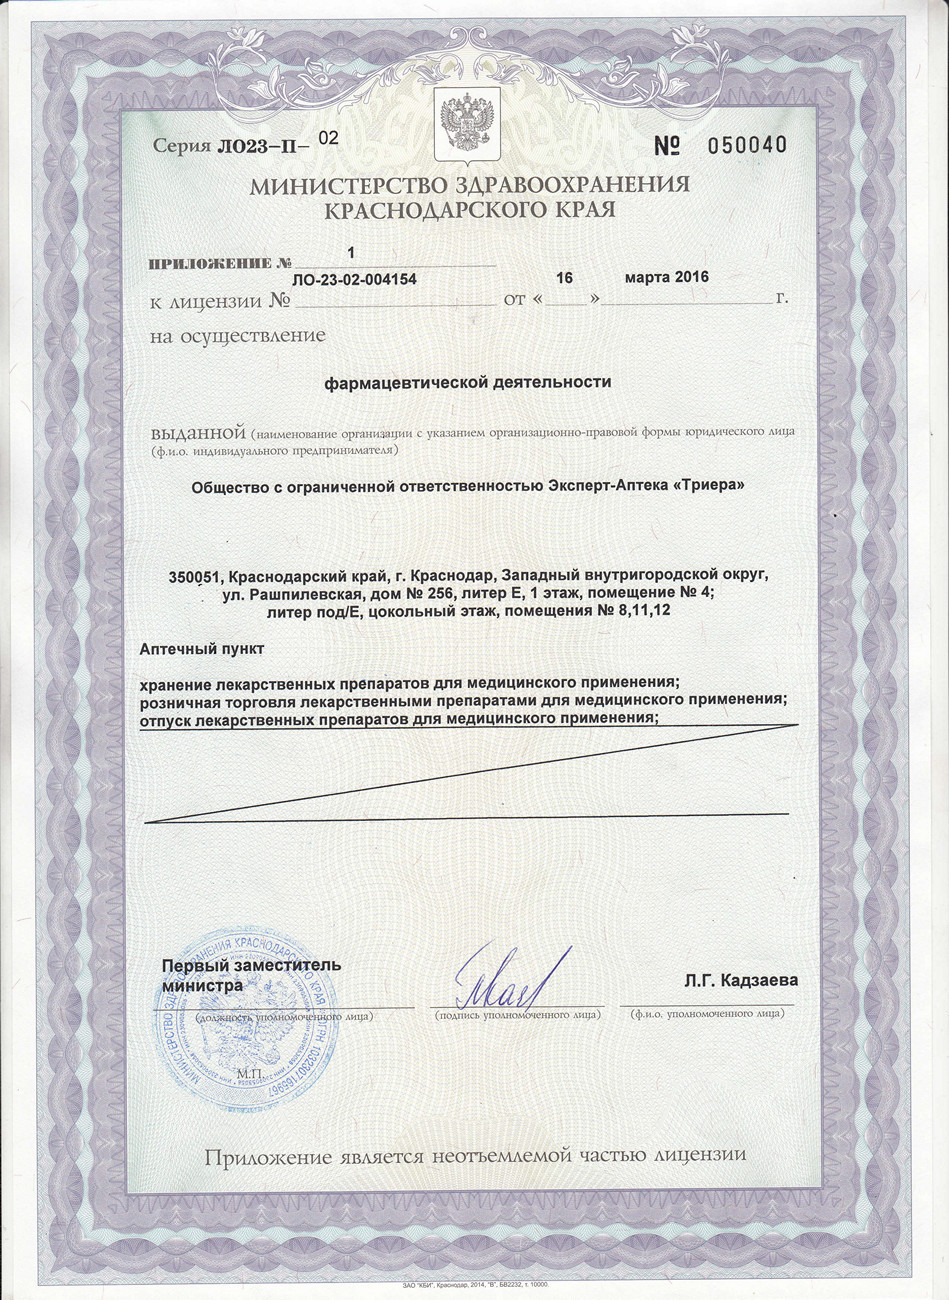 apteka-license-03